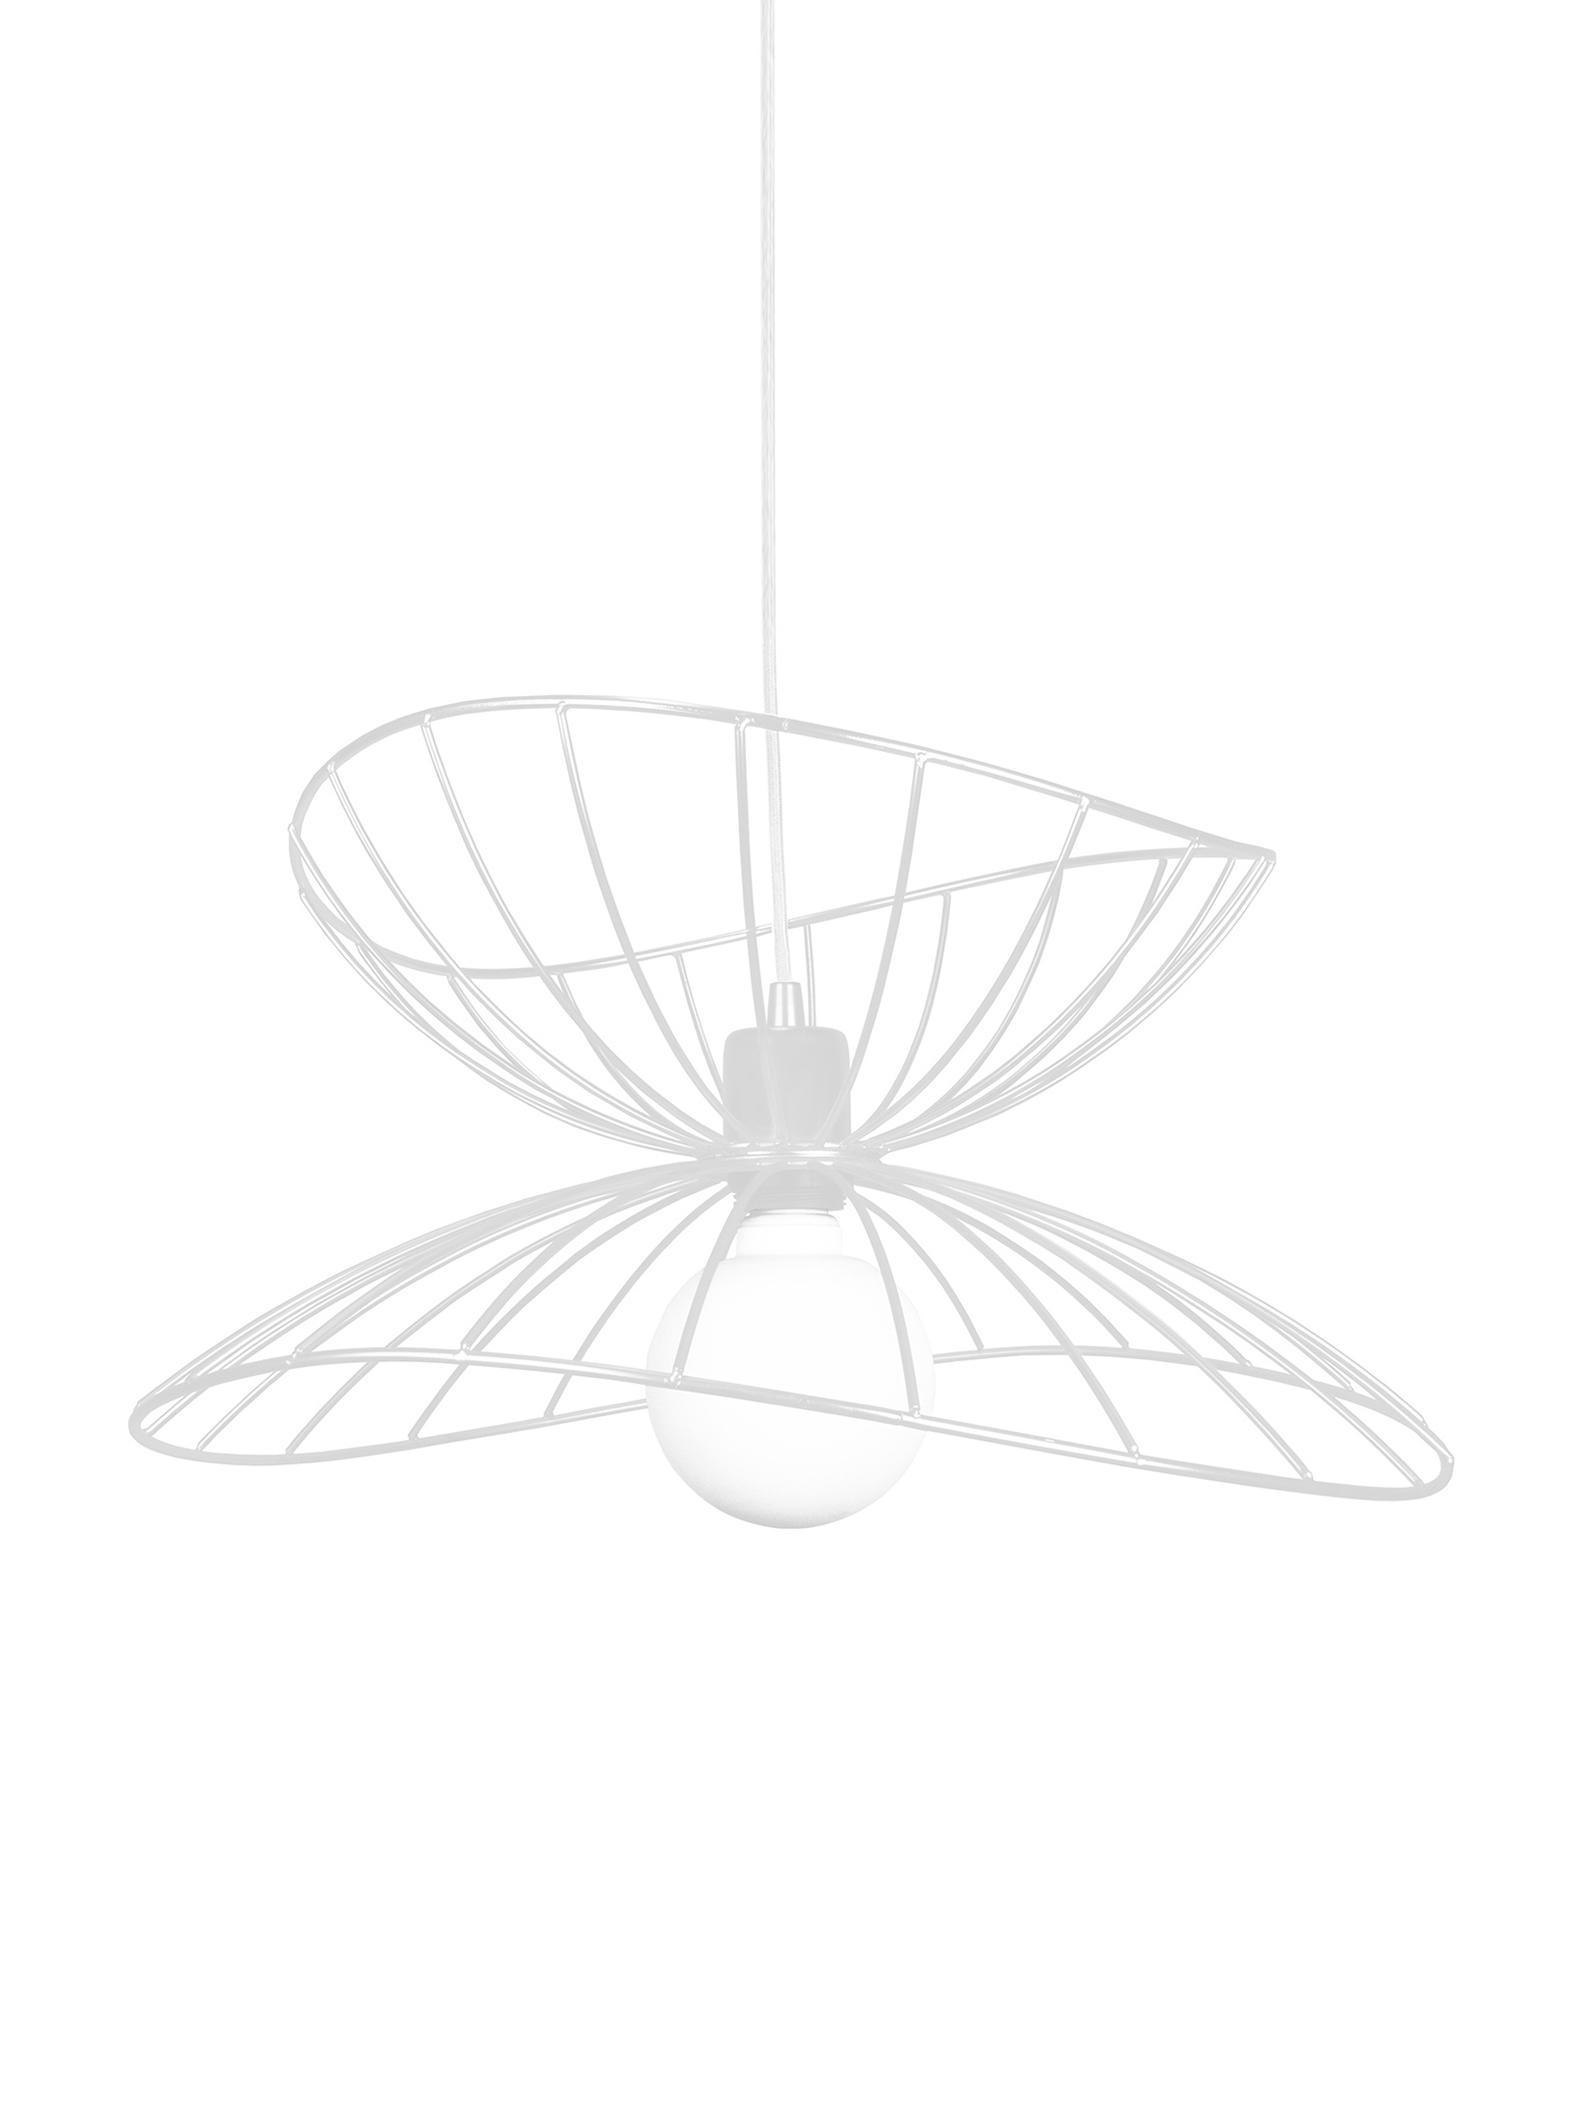 Lampada a sospensione Ray, Metallo, Bianco, Ø 45 x Alt. 25 cm